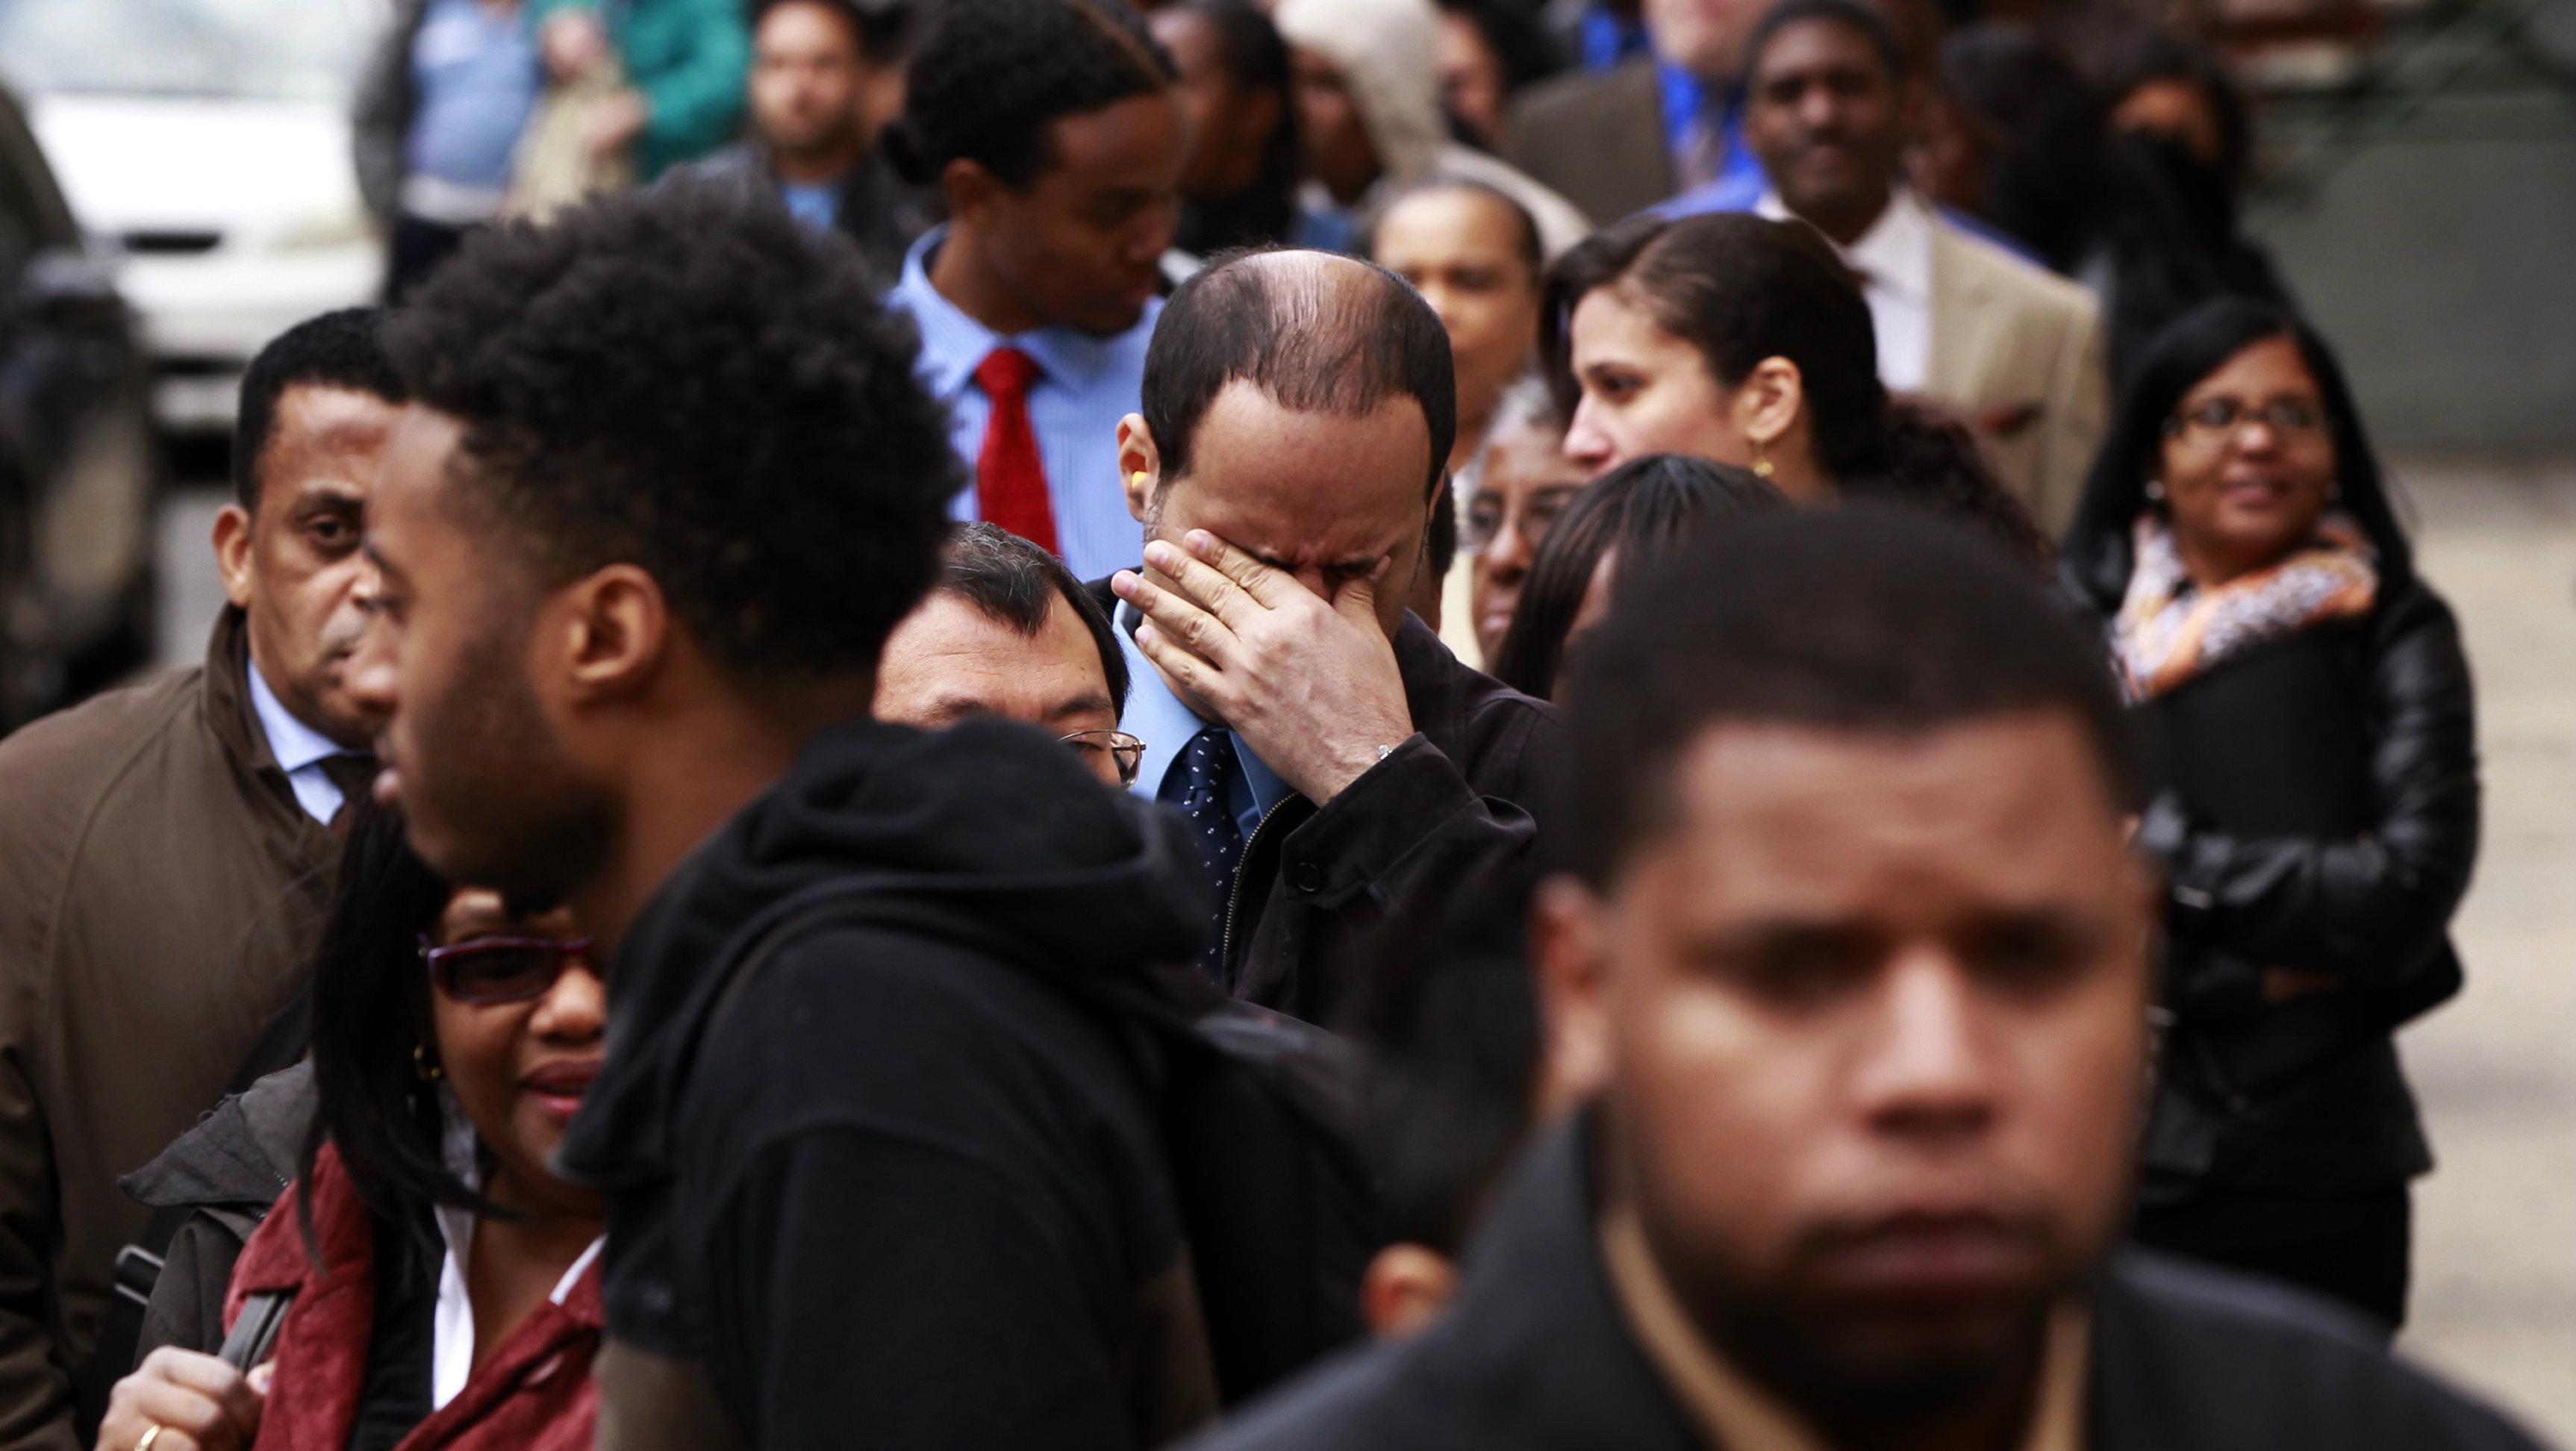 A man rubs his eyes as he waits in a line of jobseekers.